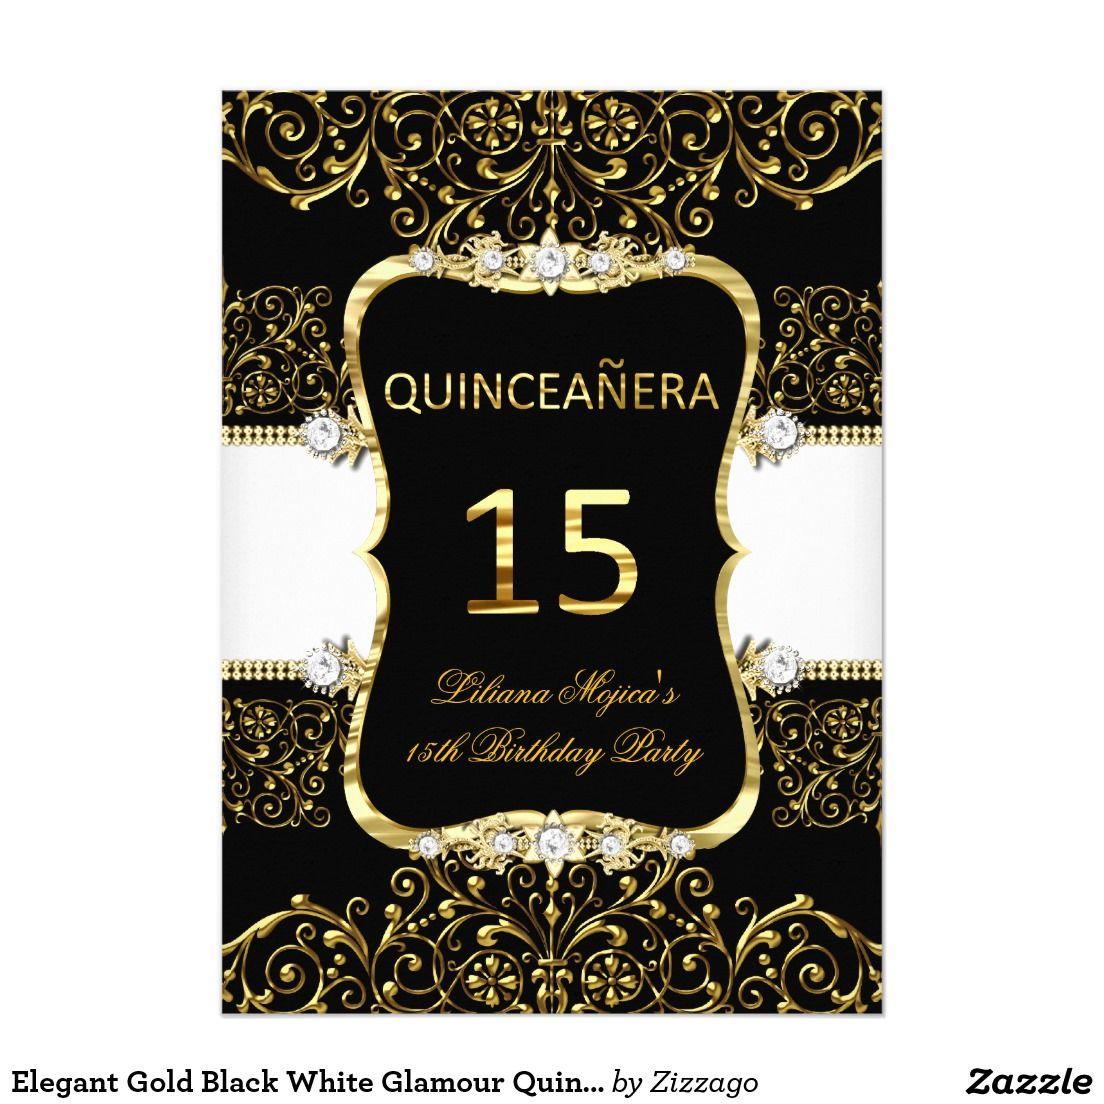 2a94e7e28b Elegant Gold Black White Glamour Quinceanera Invitation